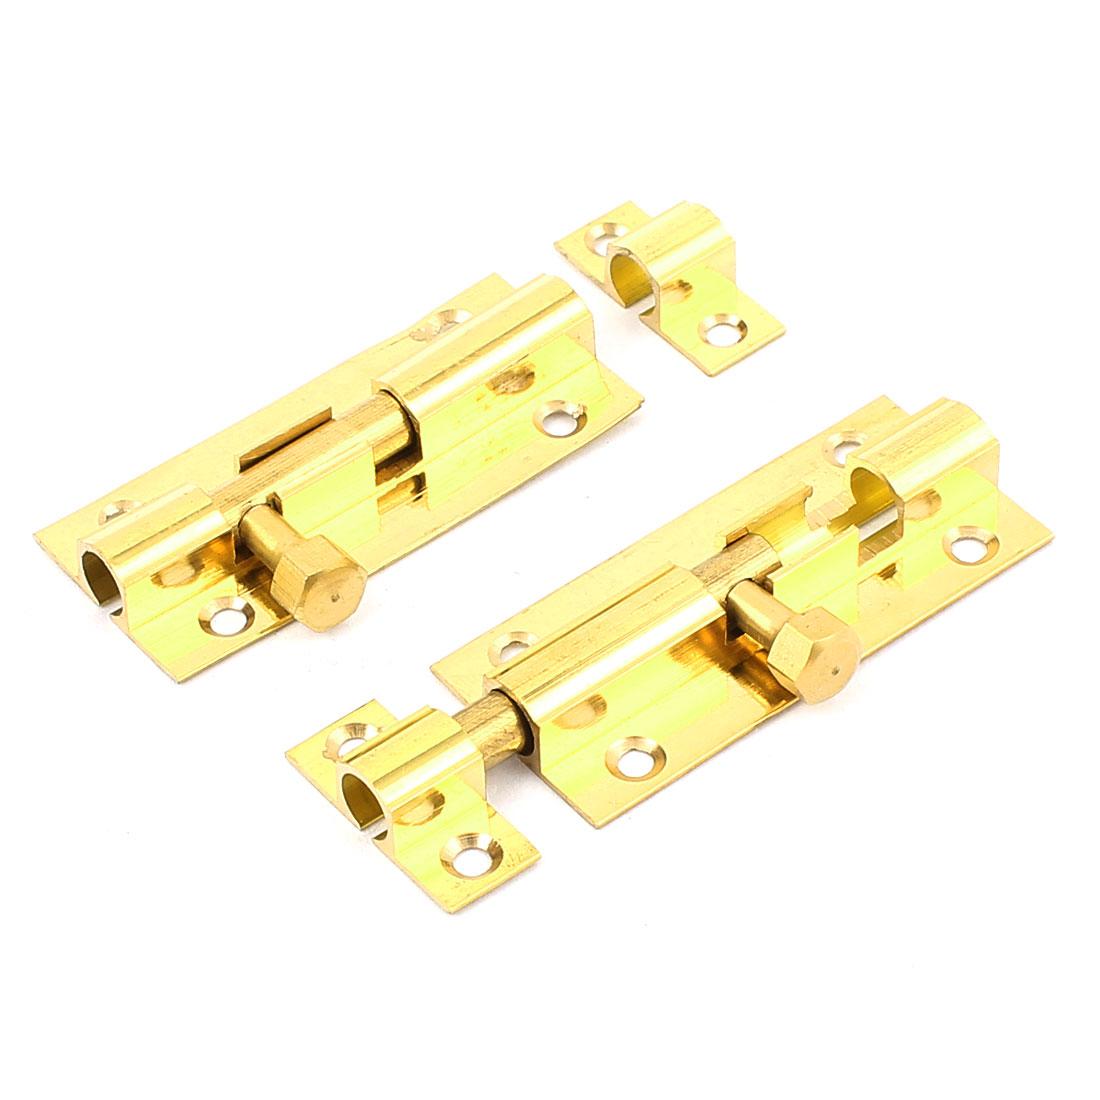 Door Window Latch Solid Brass 2-Inch Barrel Bolt Hardware 2pcs